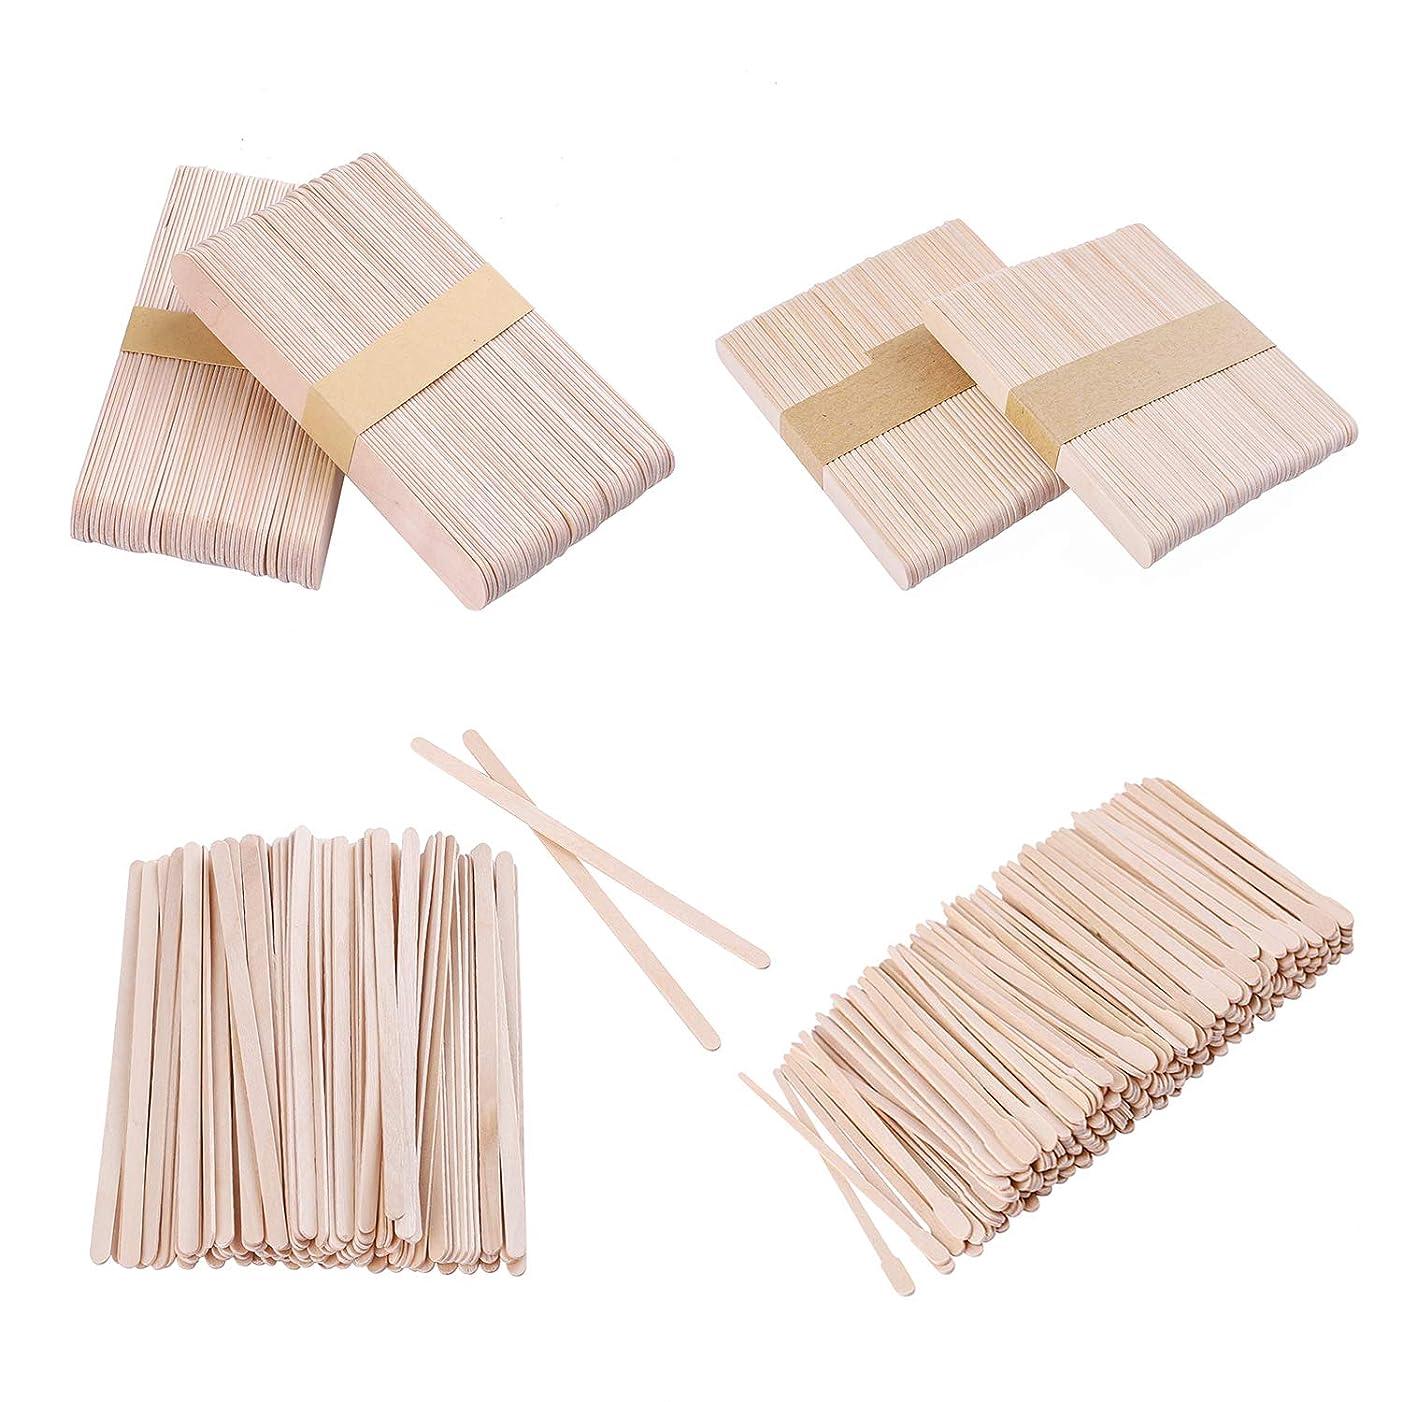 Whaline 4 Style Assorted Wax Spatulas Wax Applicator Sticks Wood Craft Sticks, Large, Medium, Small, 500 Pieces